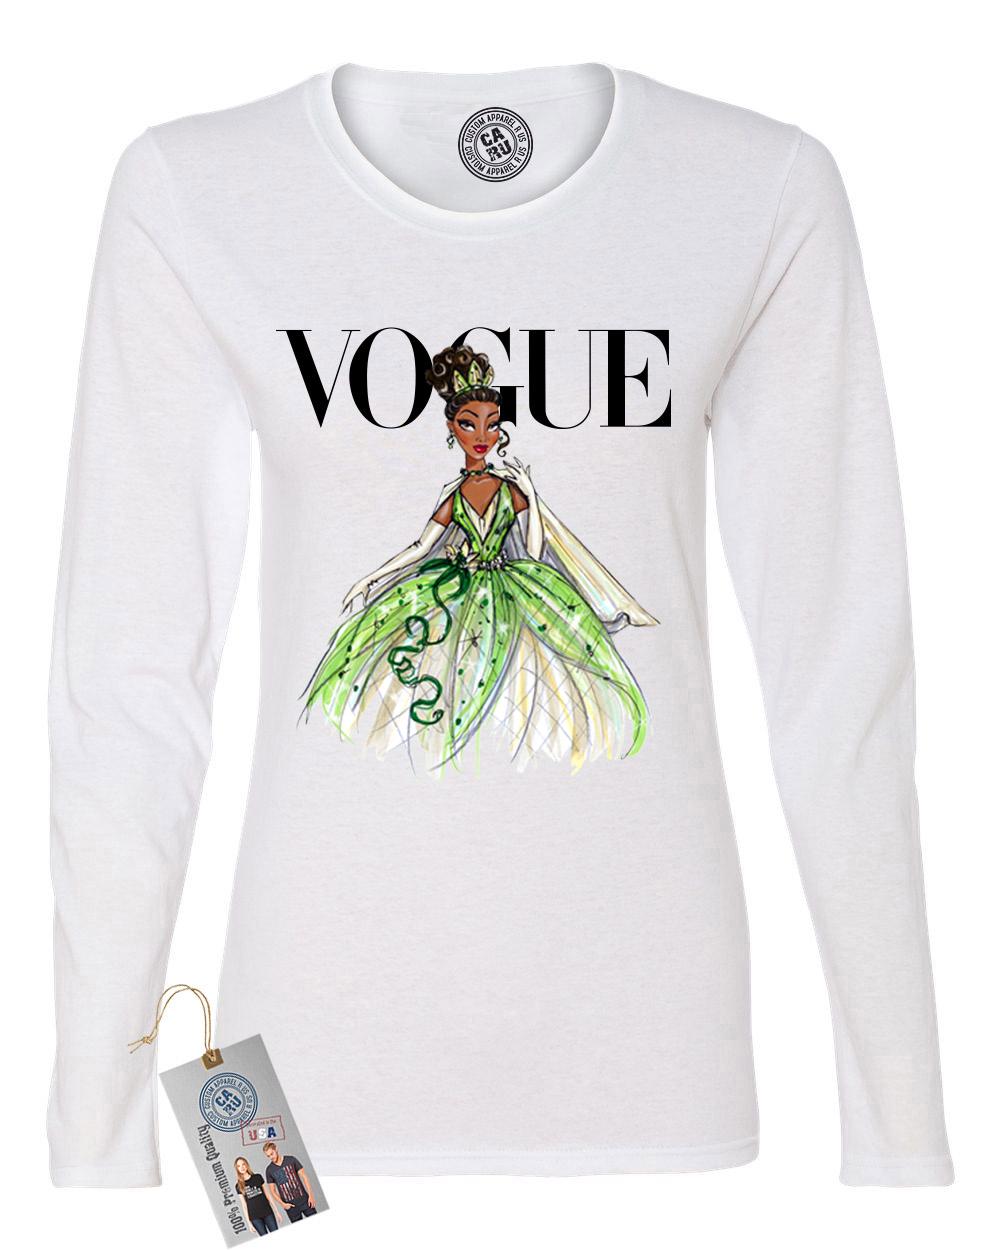 Custom Apparel R Us Vogue Princess Shirt Tiana Womens Long Sleeve